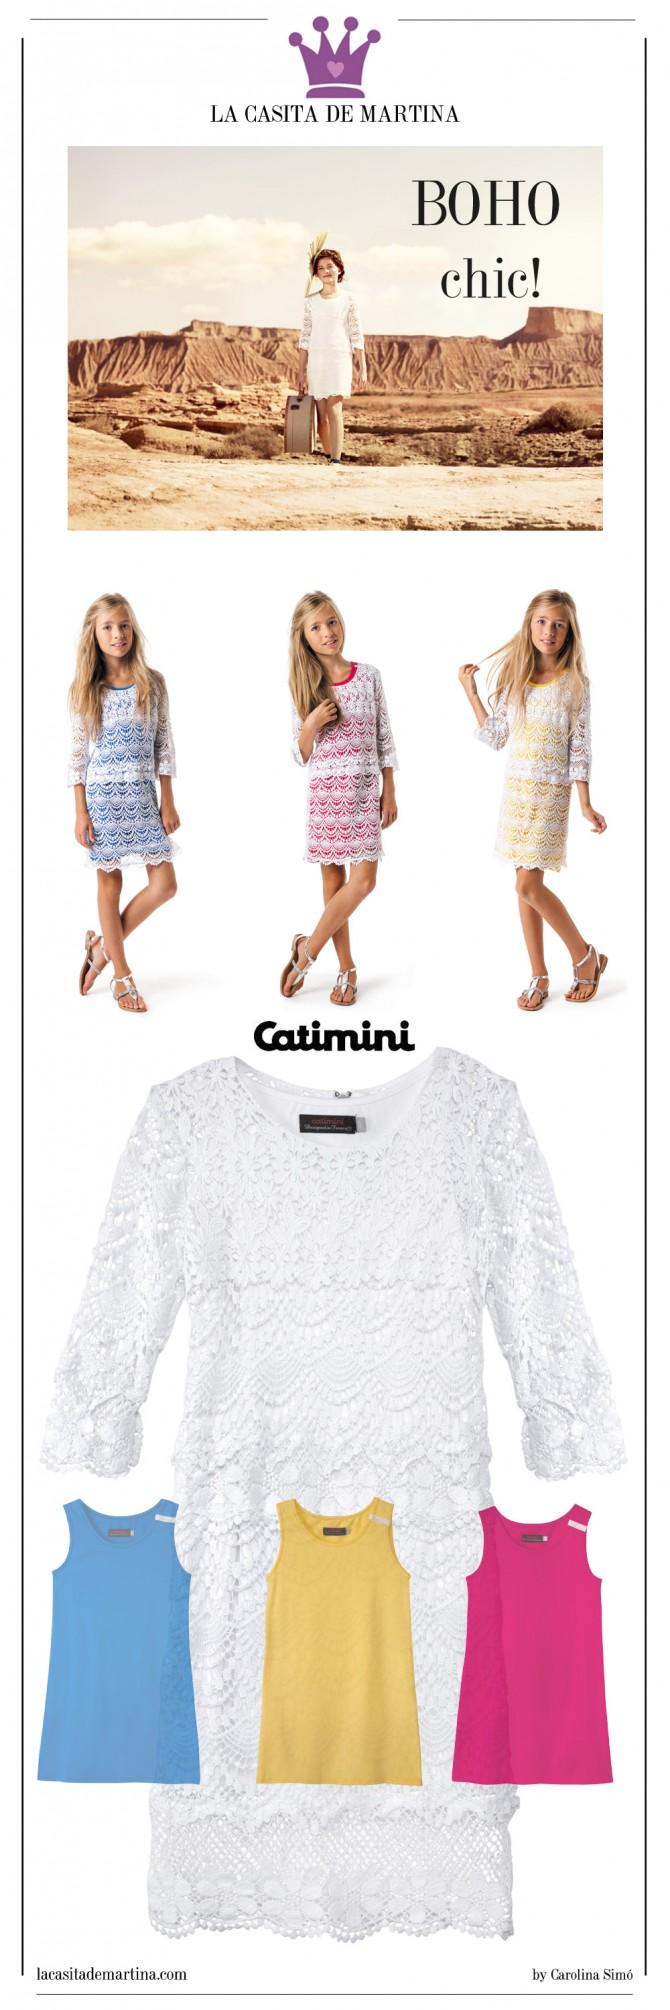 Catimini, Moda Infantil, La casita de Martina,  Blog Moda Infantil